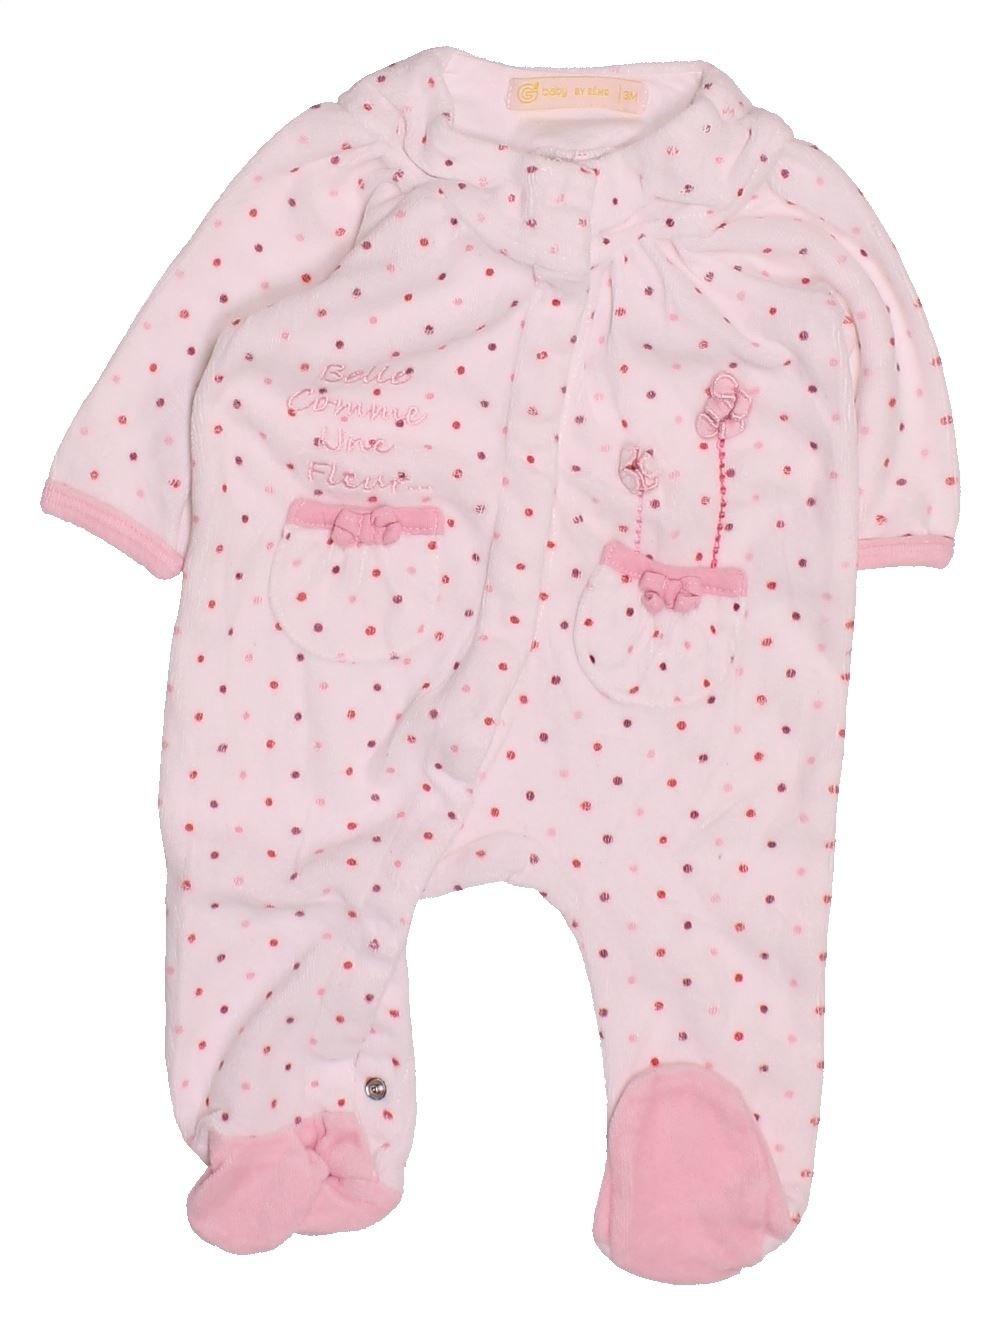 9aefcc94e3d1f Pyjama 1 piece rose GEMO du 3 mois pour Fille - 1494823